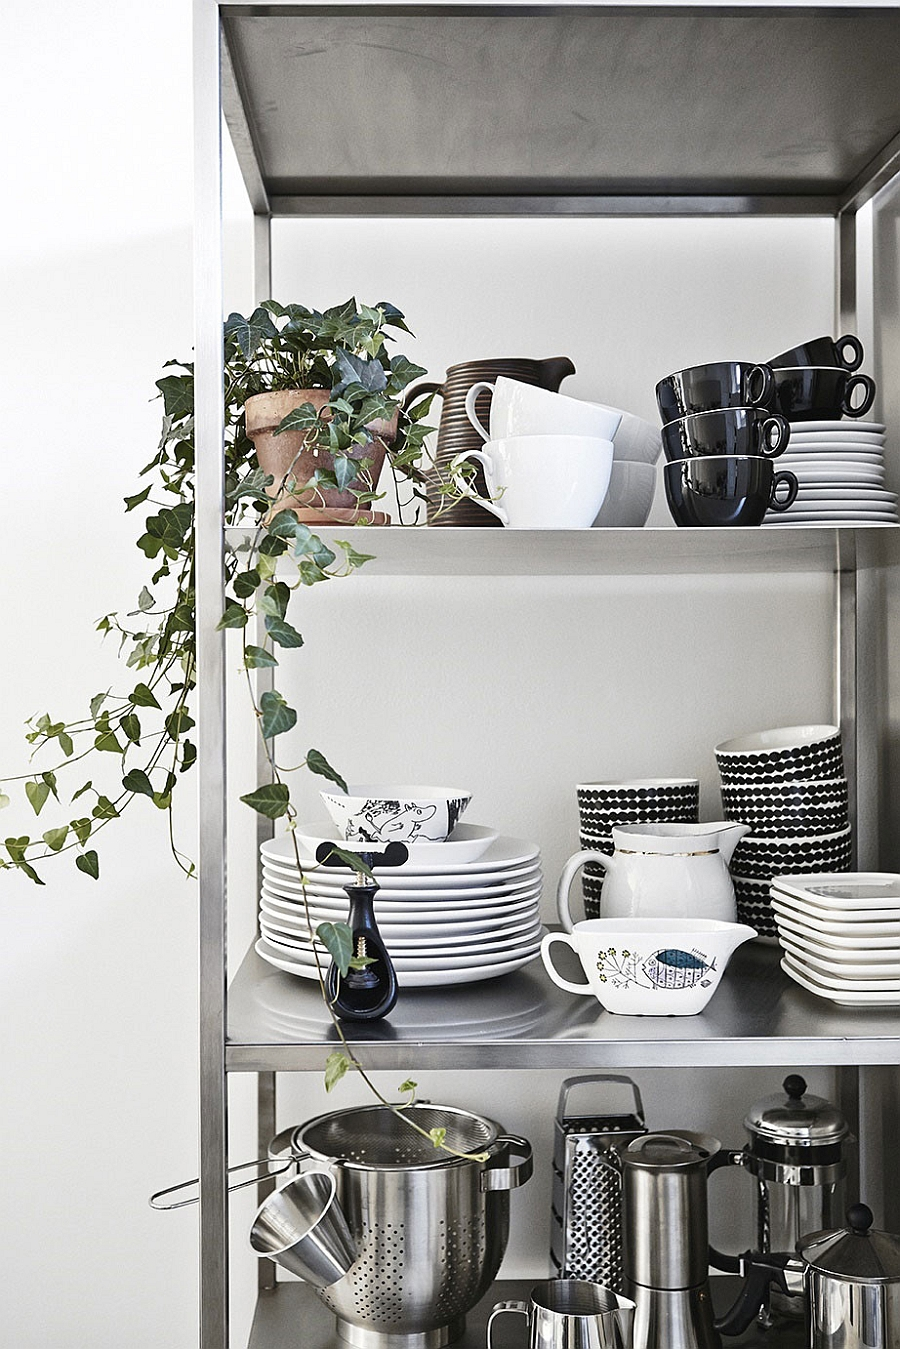 Using kitchenware to create a wonderful display